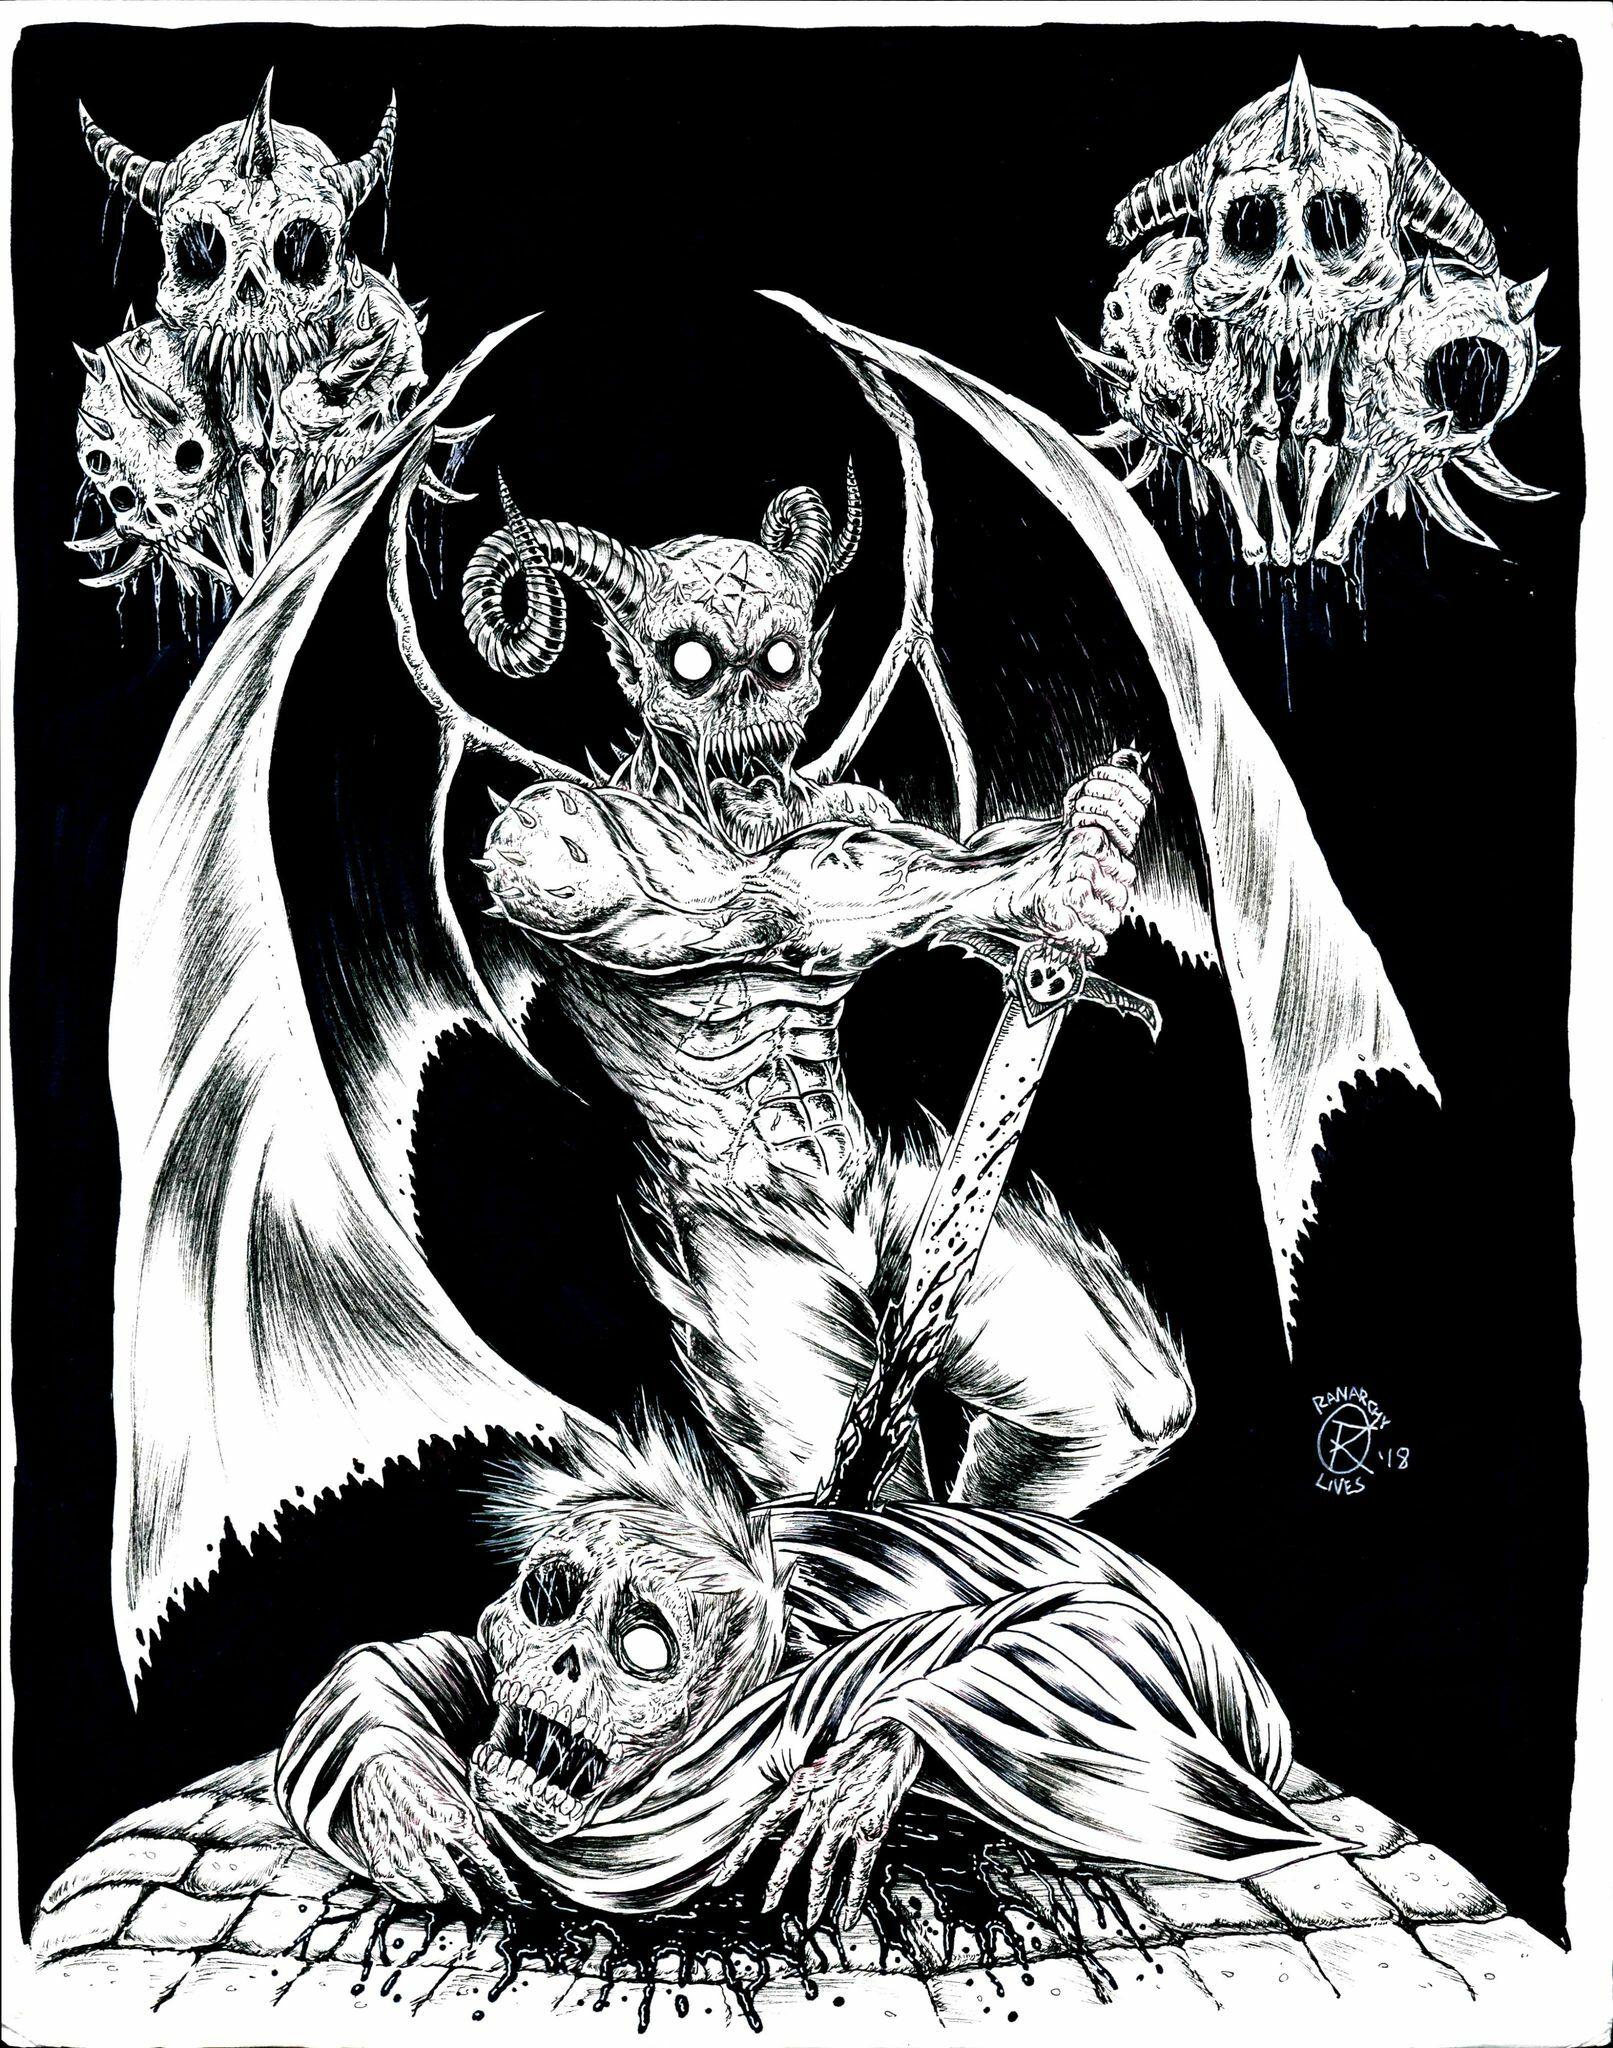 Massacre - Second Coming